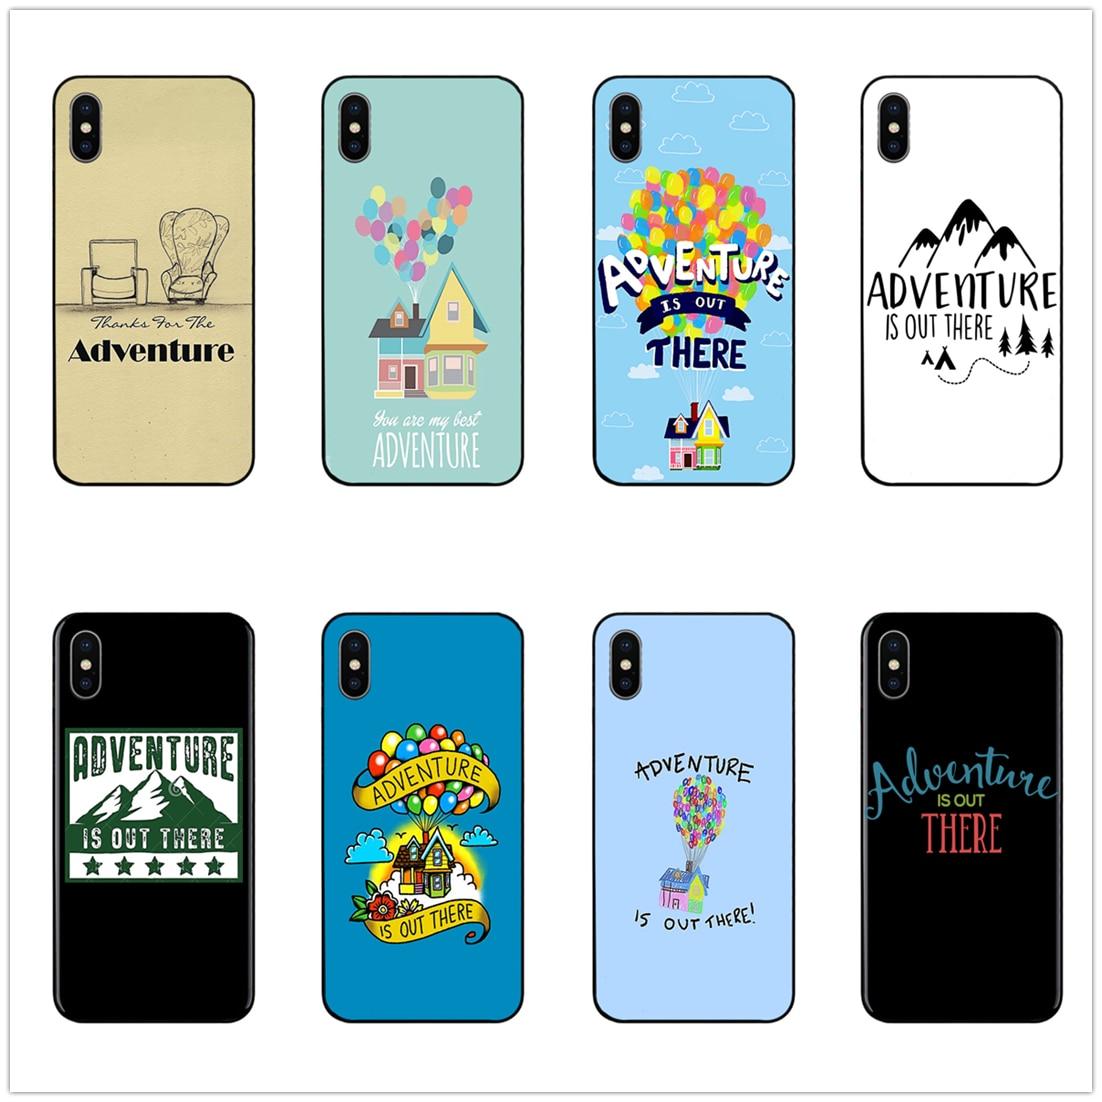 Aventura está ahí fuera teléfono caso cubierta suave para iPhone 11 Pro Max 6 7 8plus 5S X XS X XR XSMax para Samsung s10 s9 s8 Serie